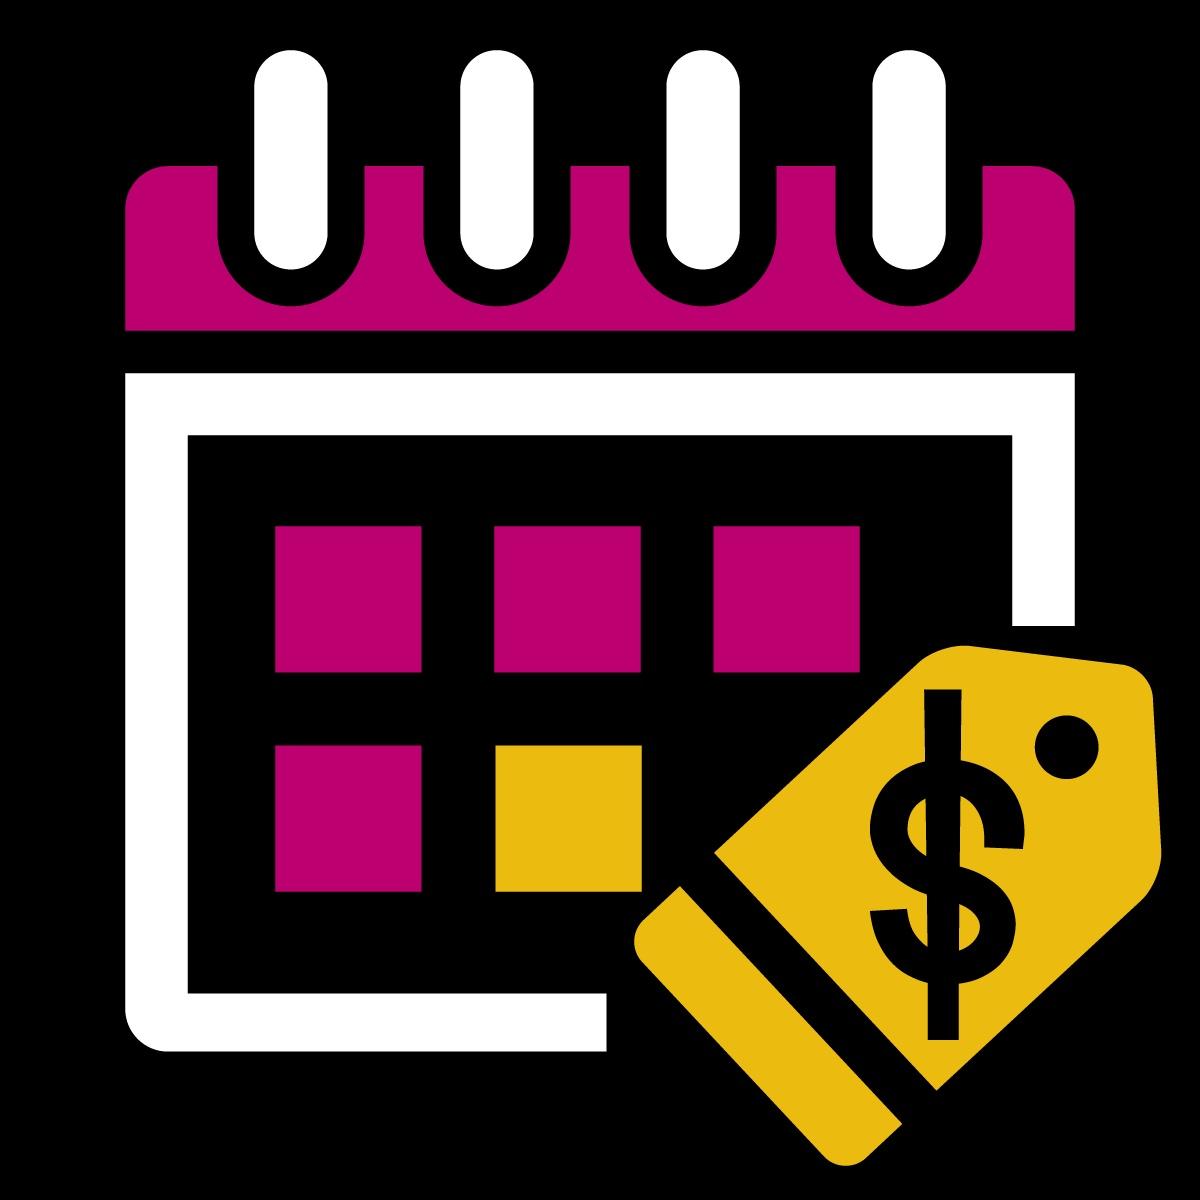 Shopify Sales Channel app by Strategic feed